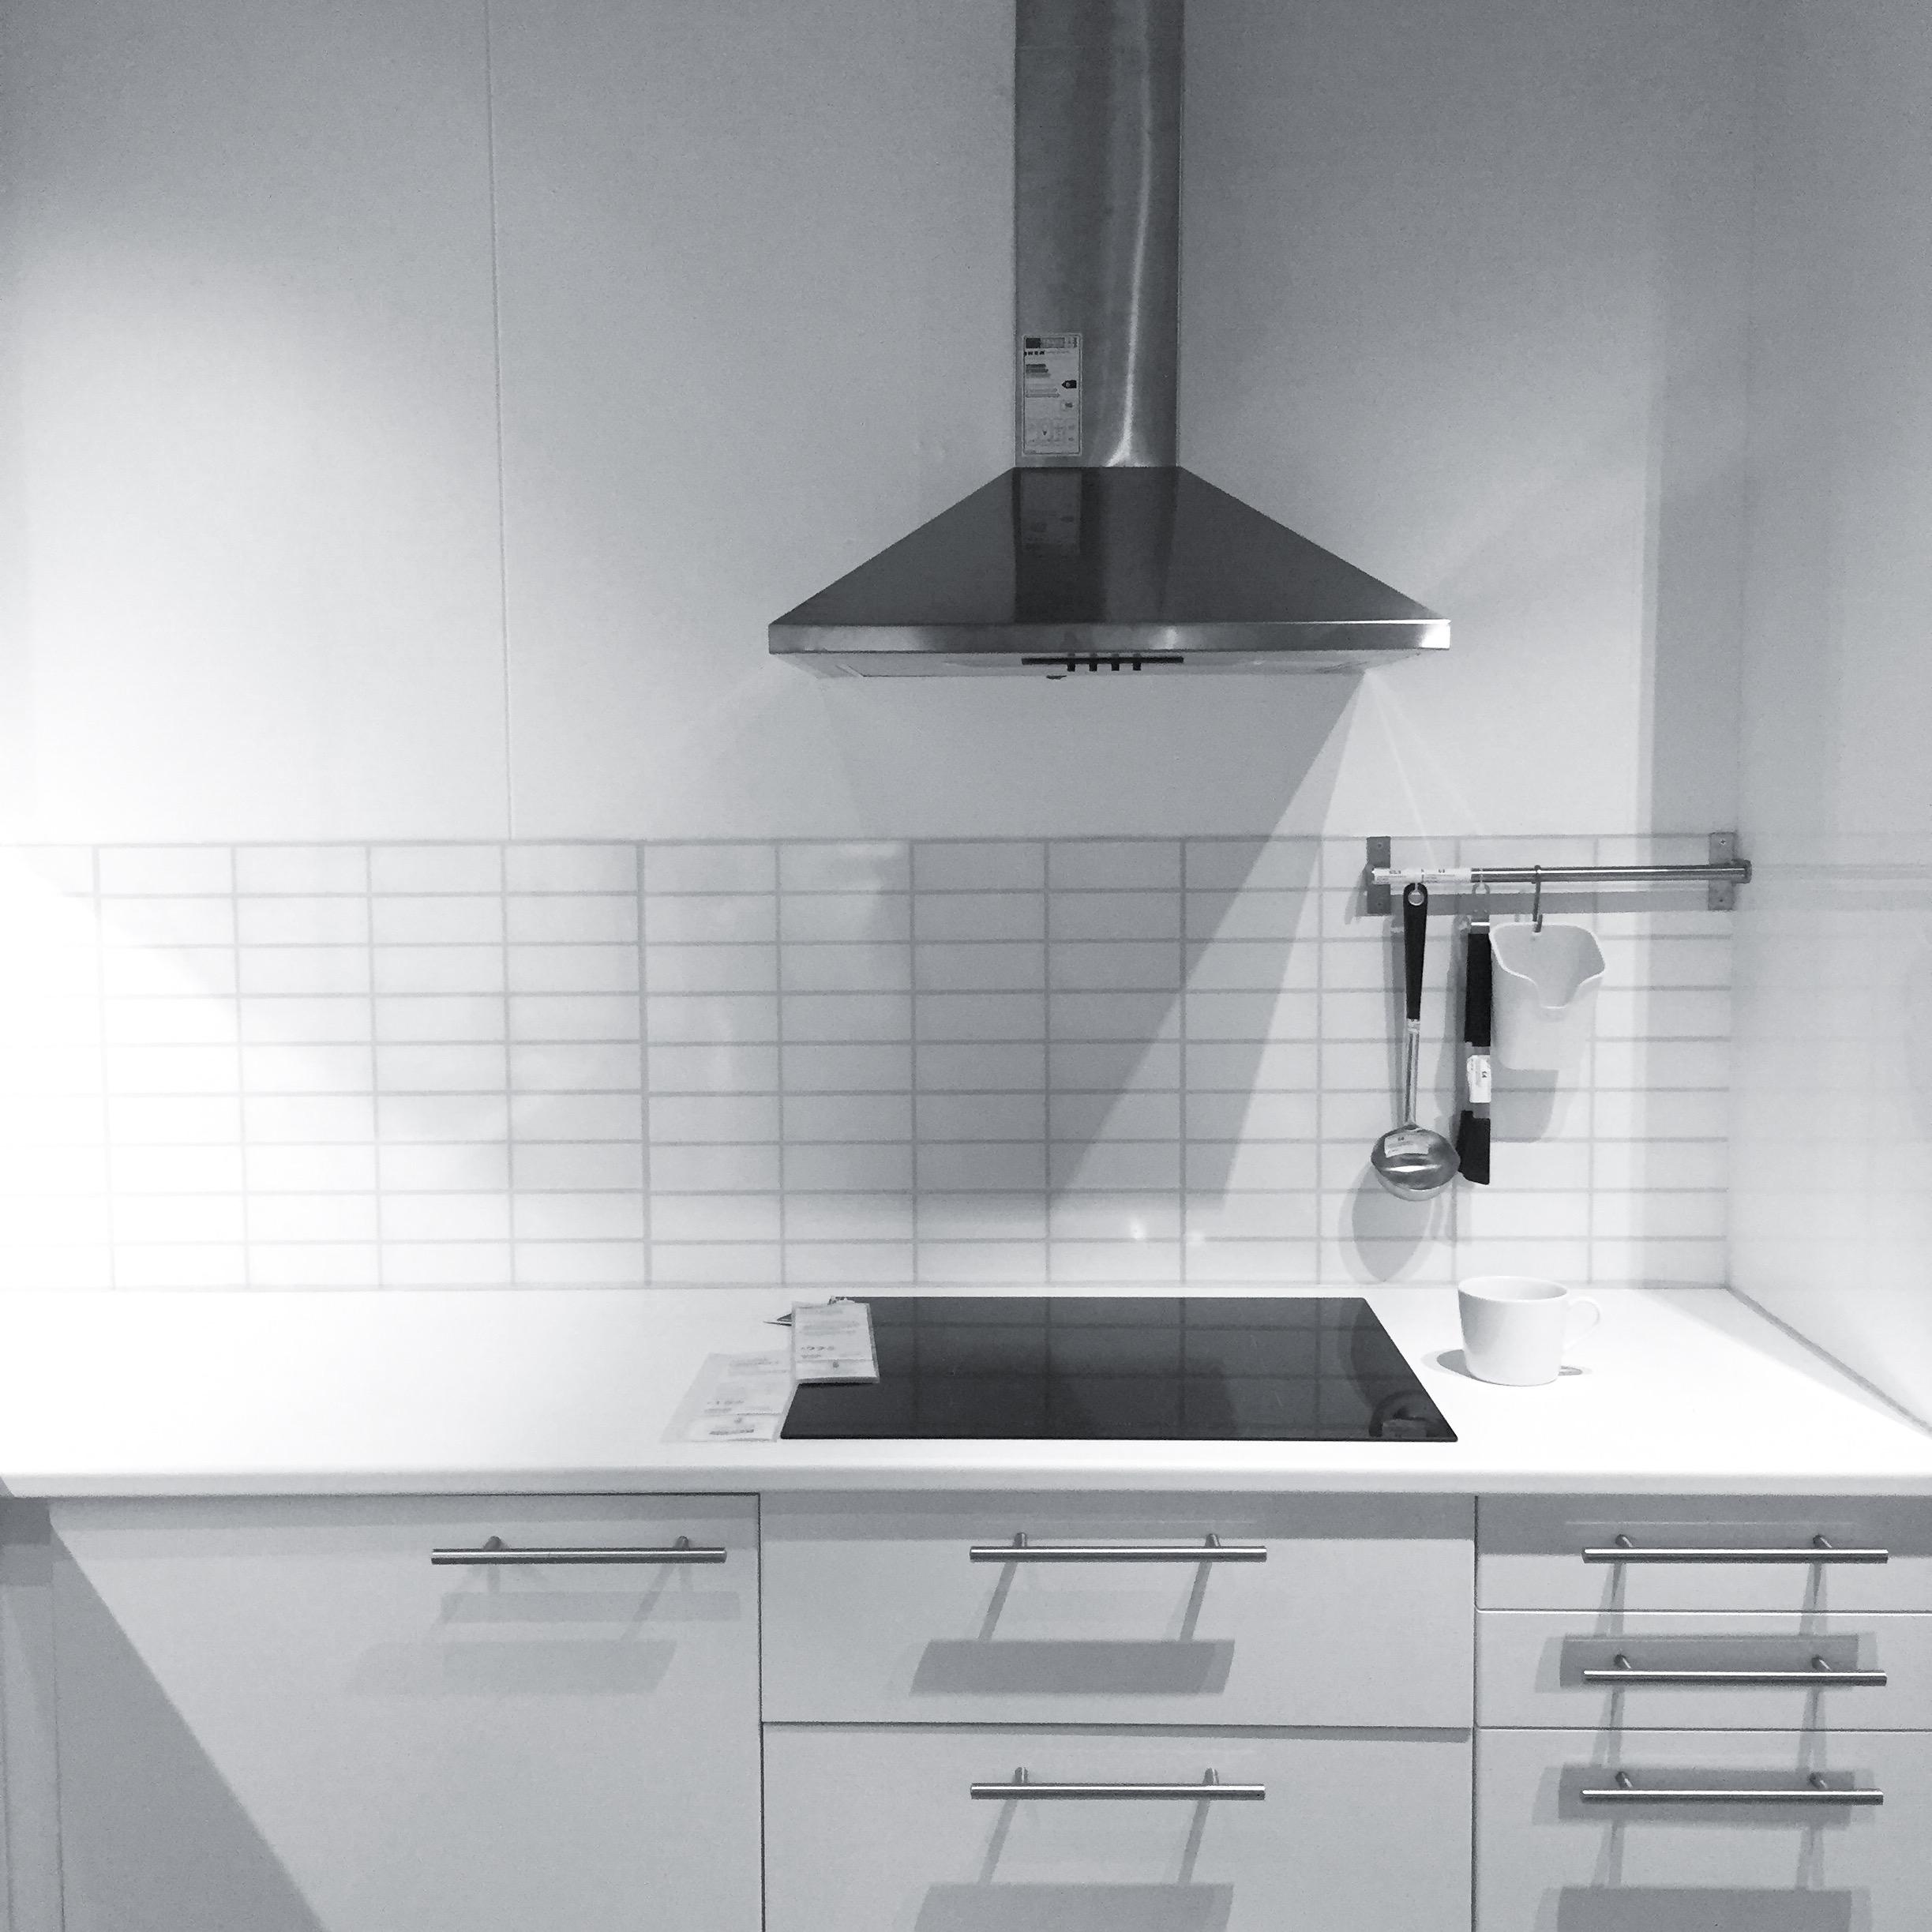 Black Kitchens Are The New White